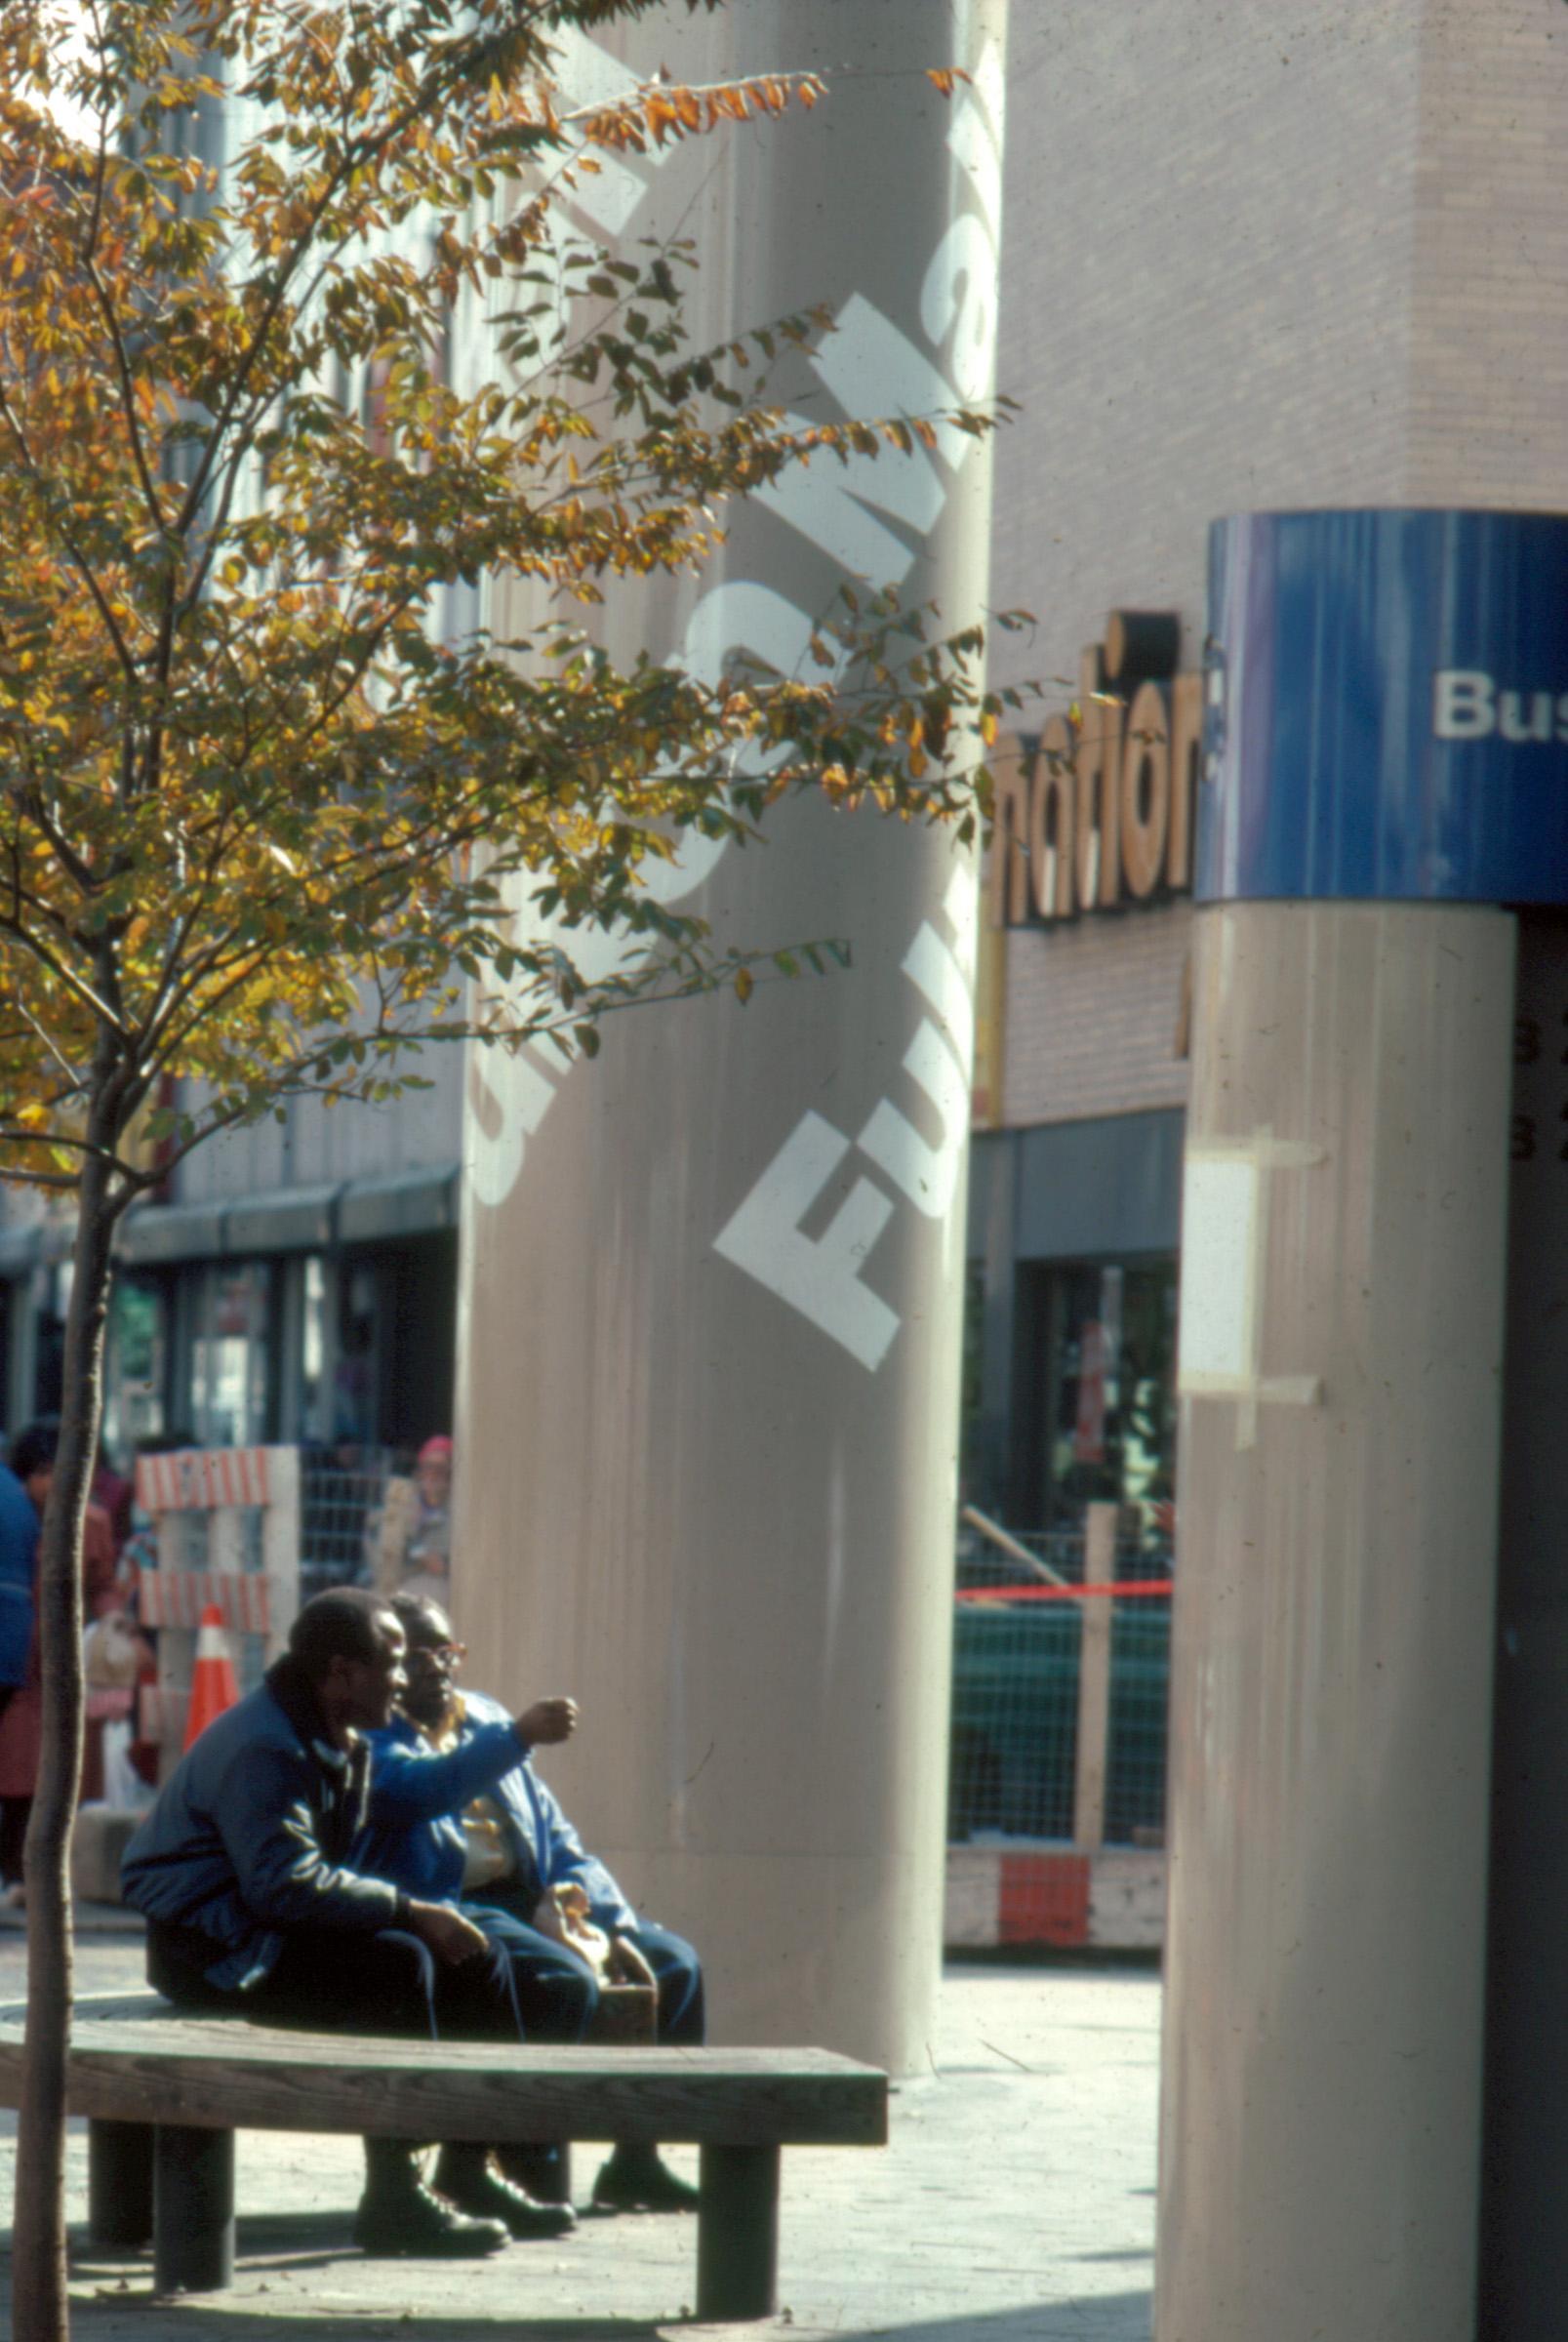 Fulton Street Mall Slide07 - Completed.jpg